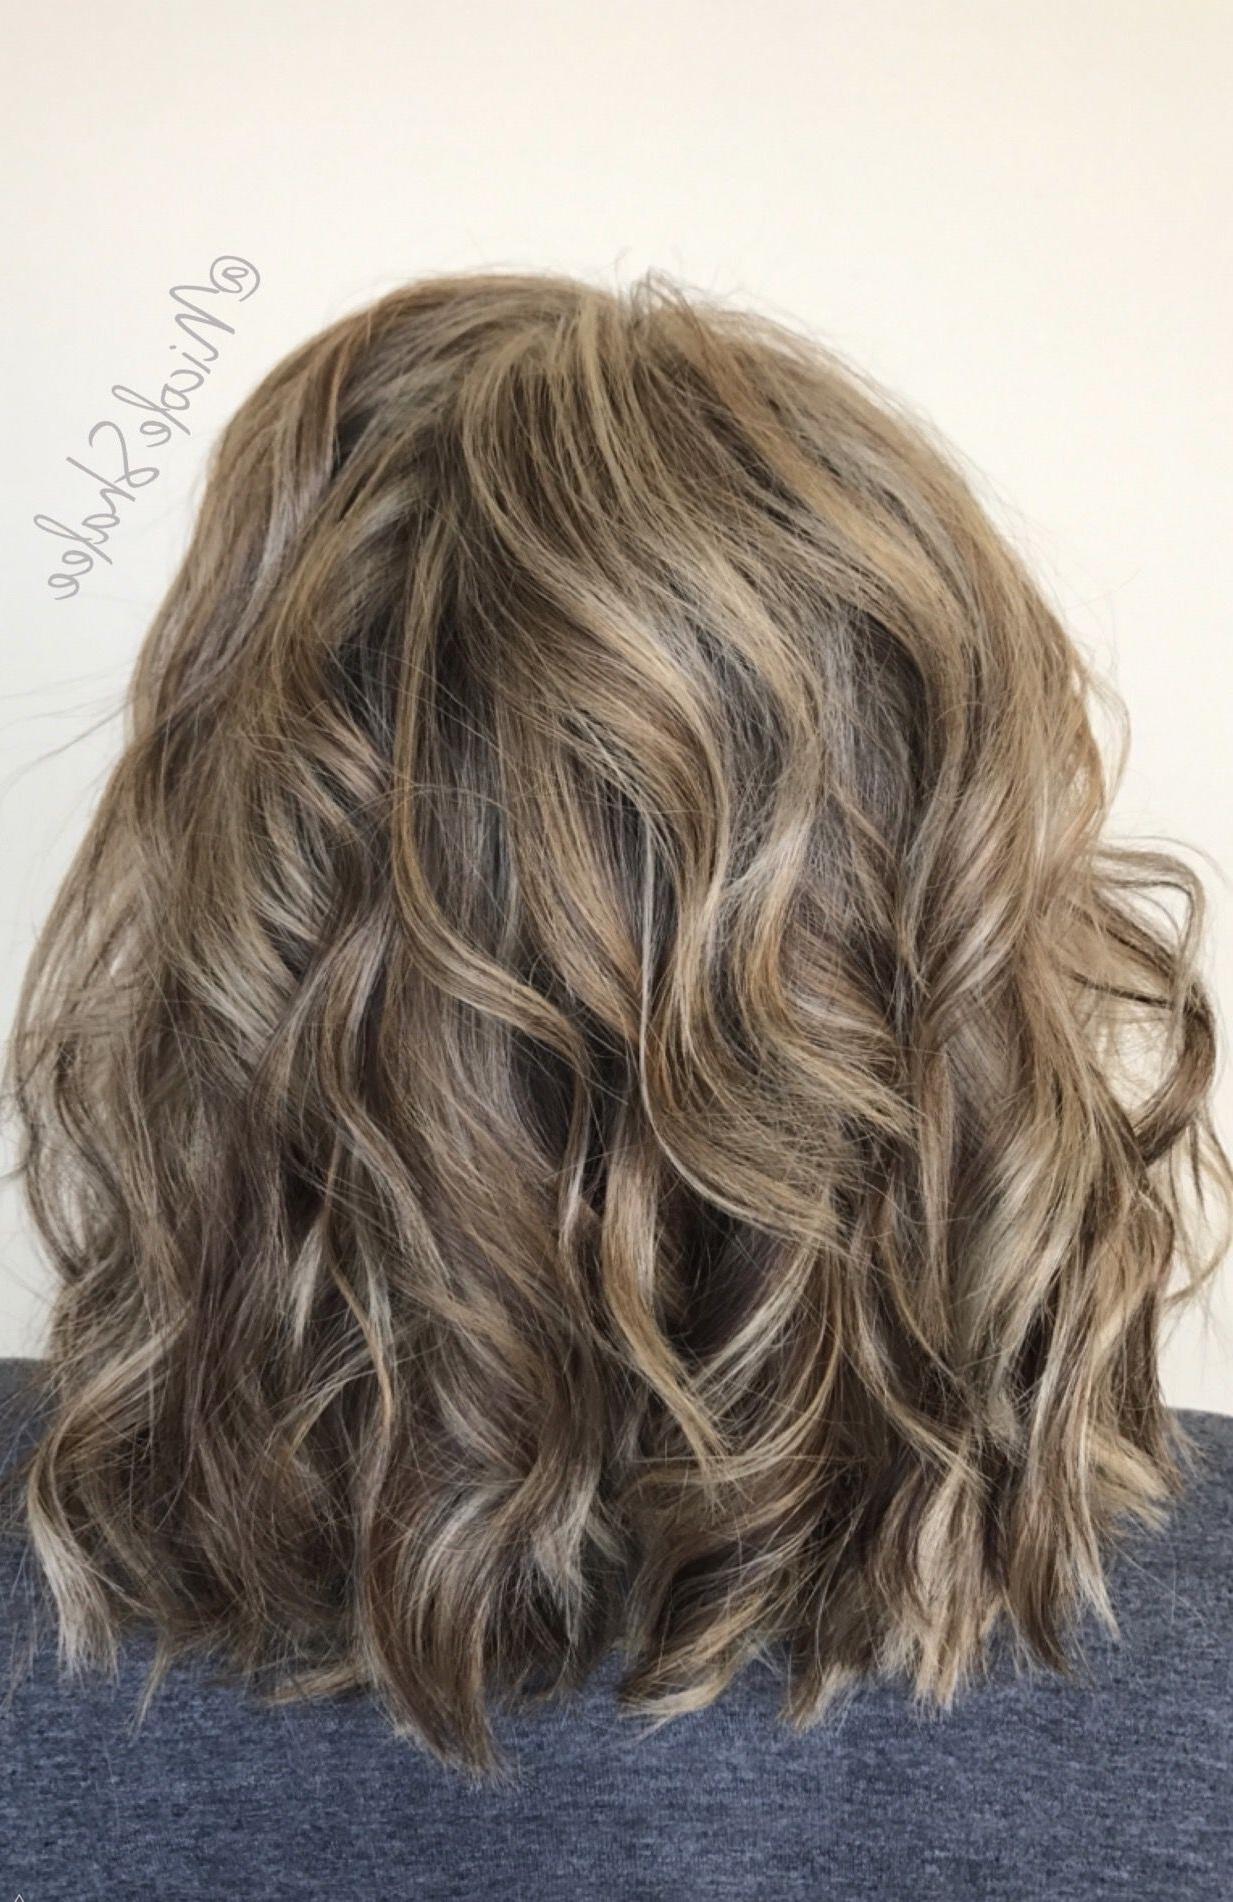 Famous Bronde Beach Waves Blonde Hairstyles Throughout Lob, Long Bob, Beach Waves, Bronde Hair, Sandy Brown Hair, Sandy (View 8 of 20)